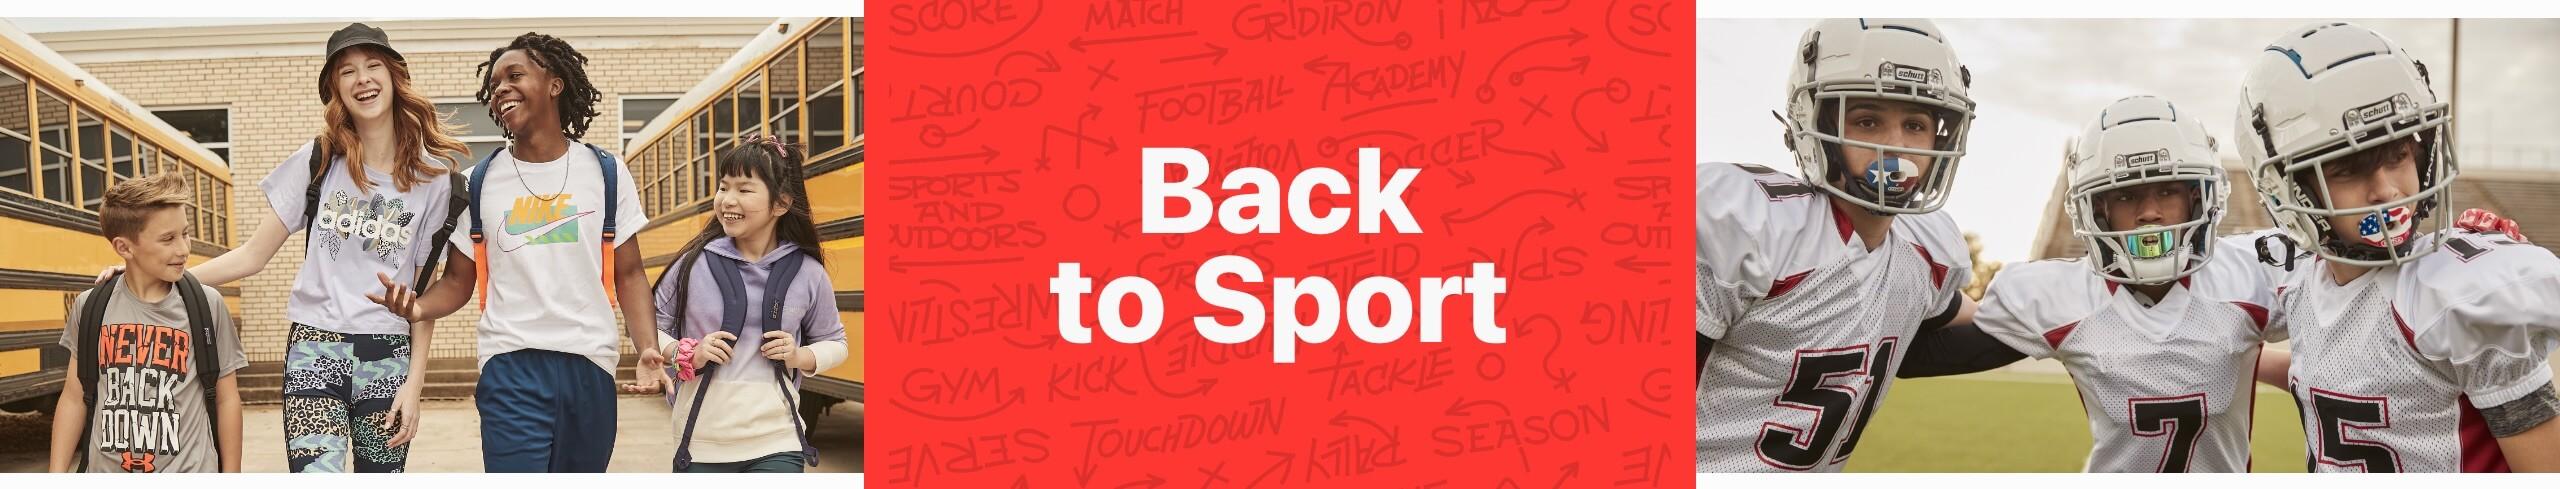 shop back to sport